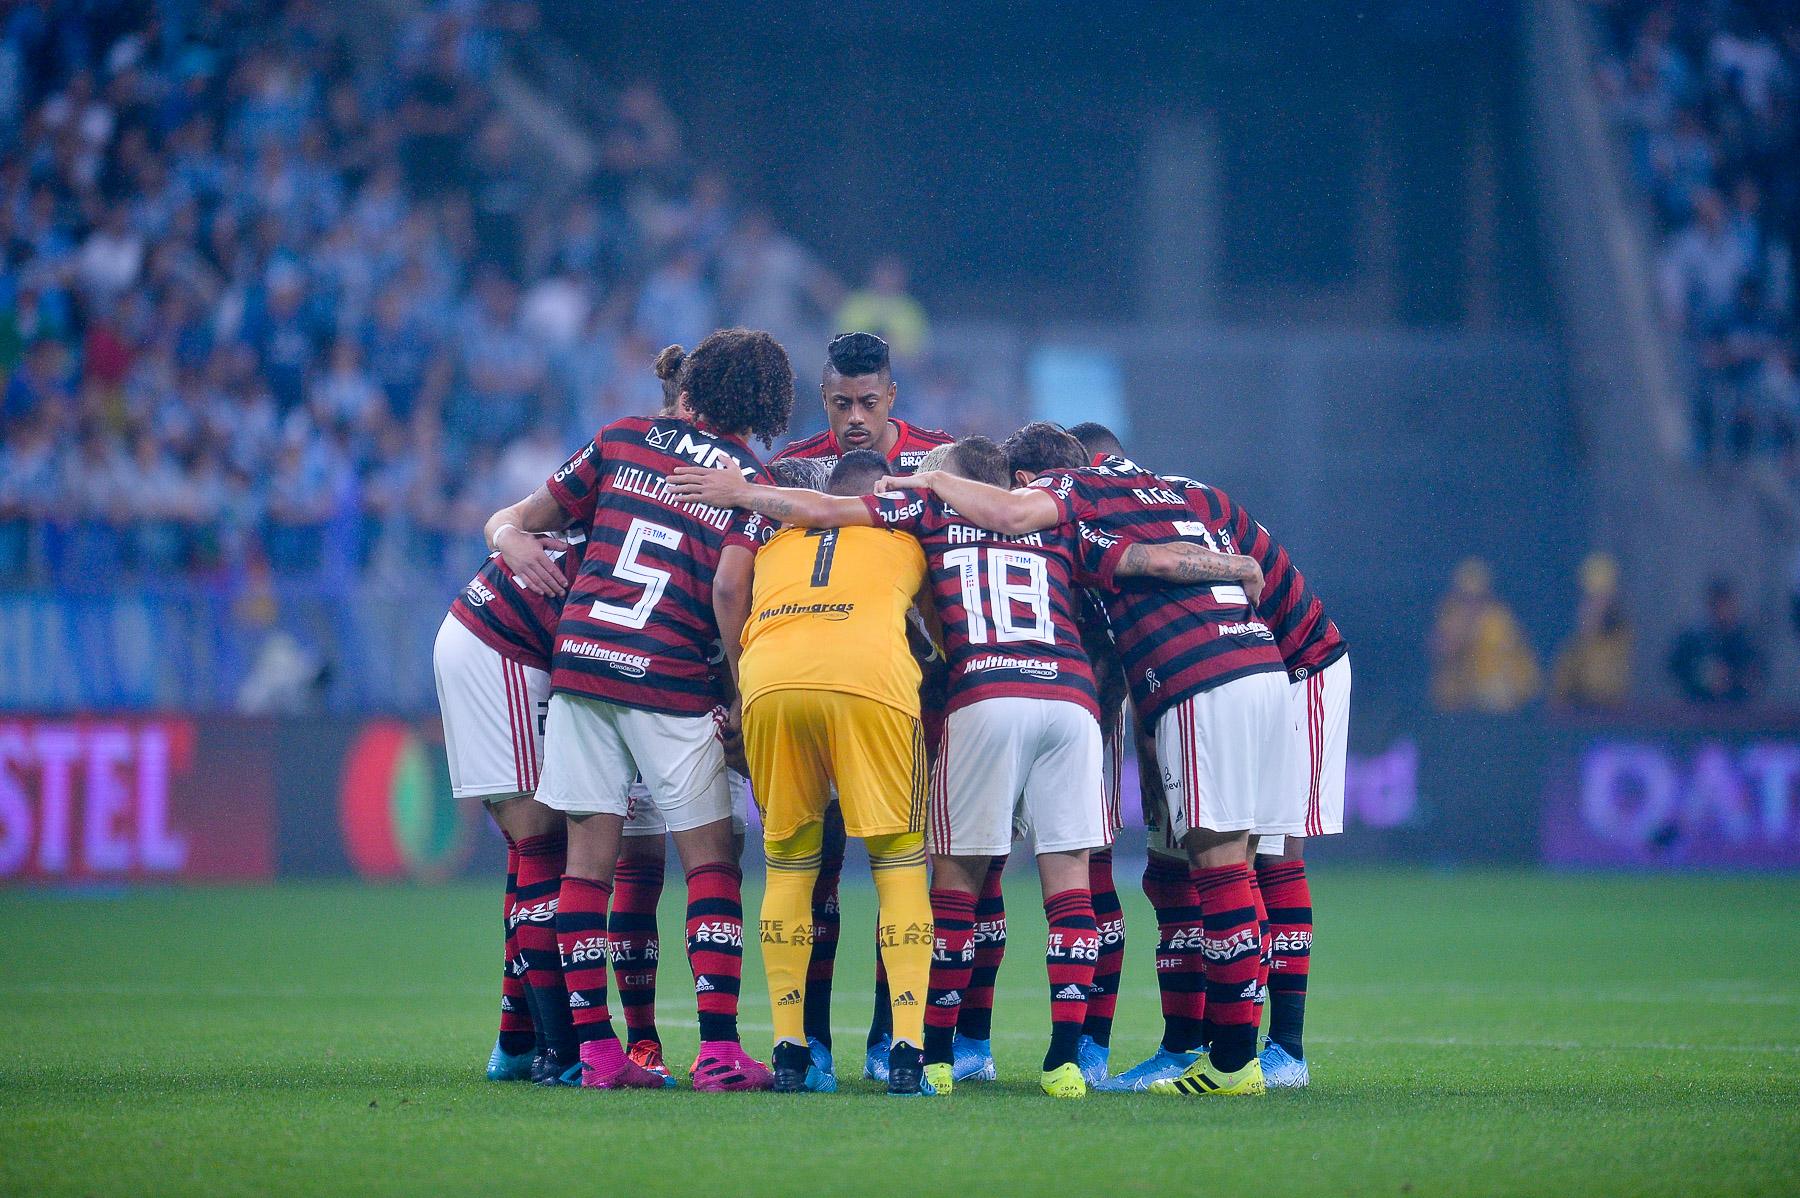 Gremio_X_Flamengo_dudabairros_Eleven_086